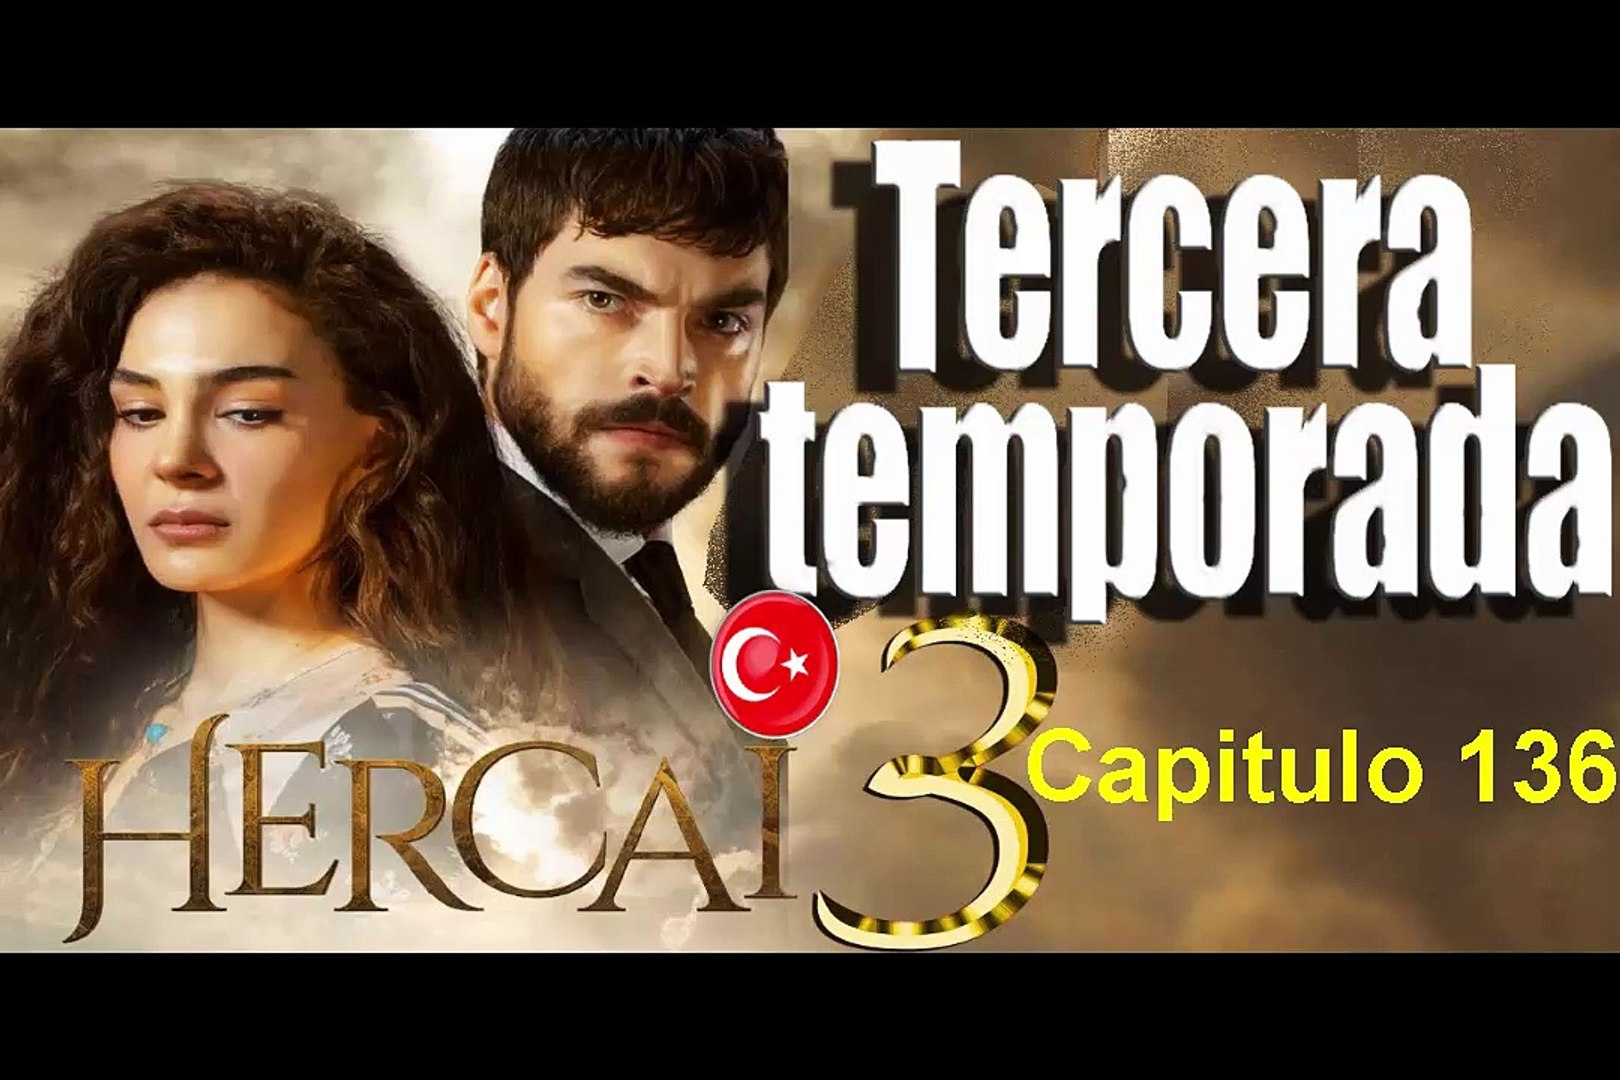 Hercai Capitulo 136 Completo Tercera Temporada Vídeo Dailymotion